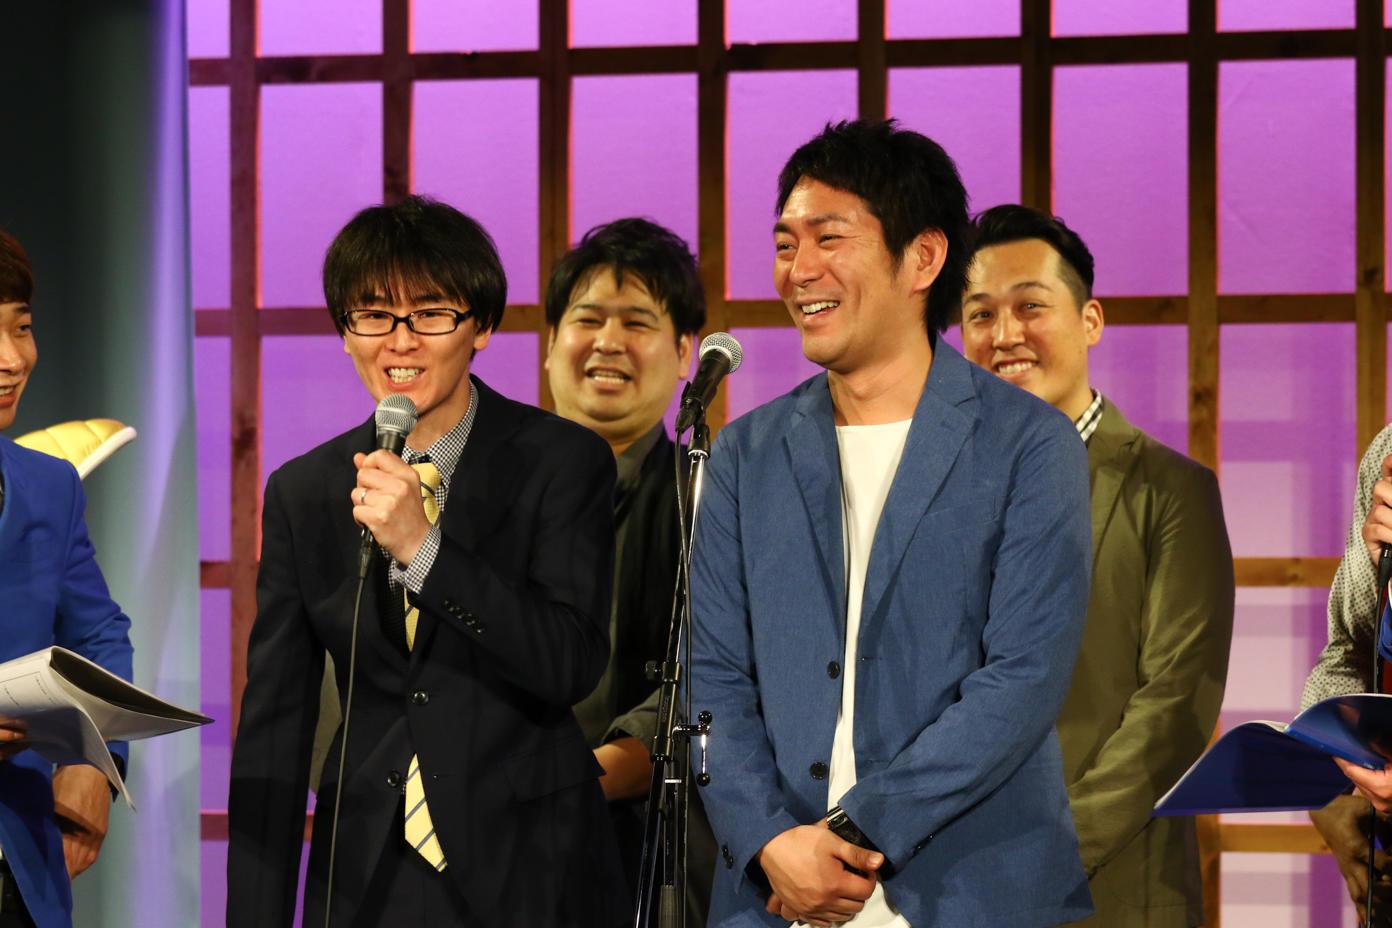 http://news.yoshimoto.co.jp/20180329150428-b6331fc863f7c92be3d0d35192d1cfe8a1641c7c.jpg